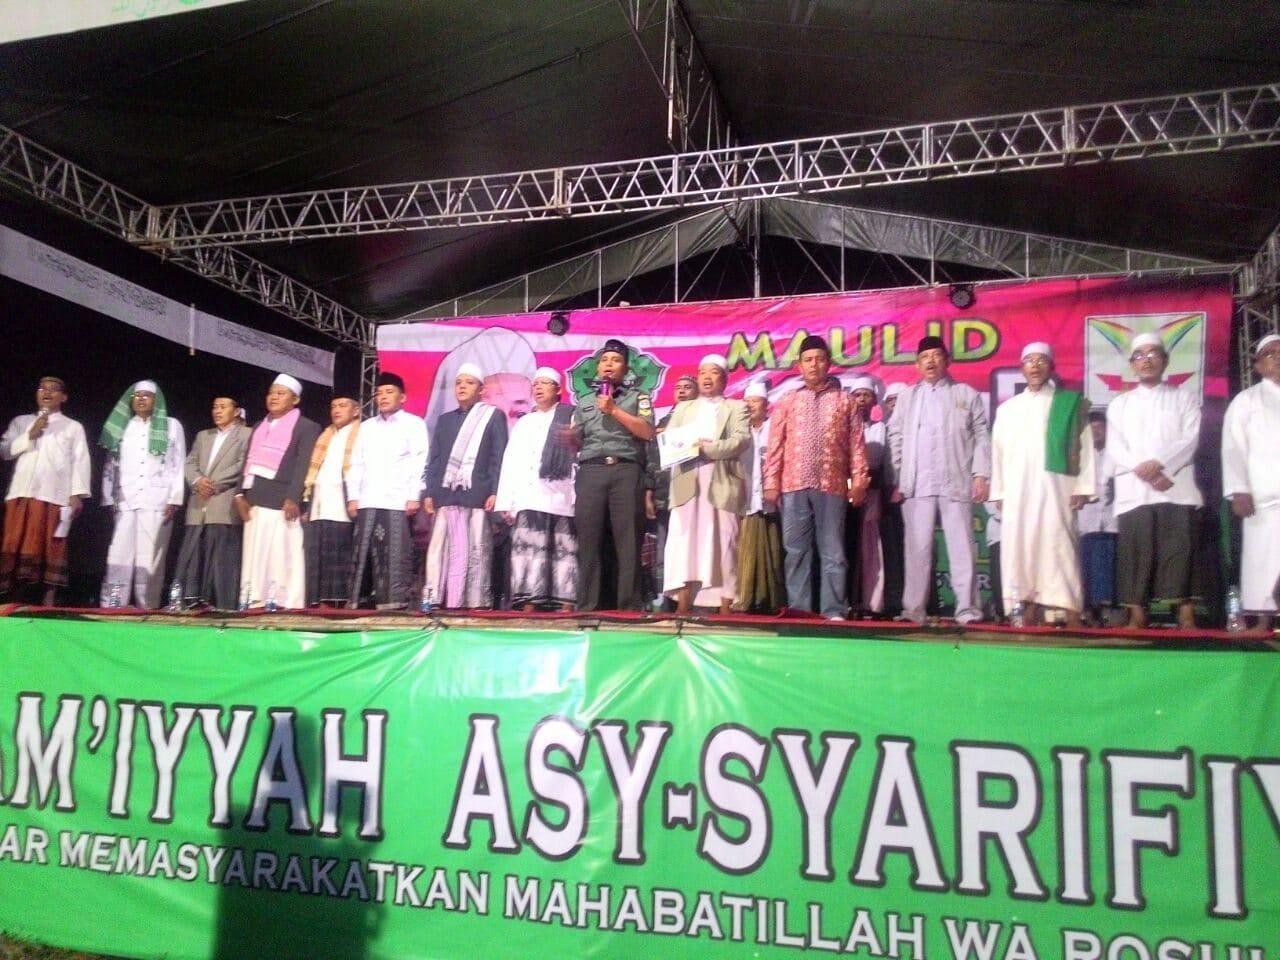 Babinsa Cengkareng Pimpin Menyanyikan Lagu Indonesia Raya Diperingatan Maulid Nabi Muhammad a